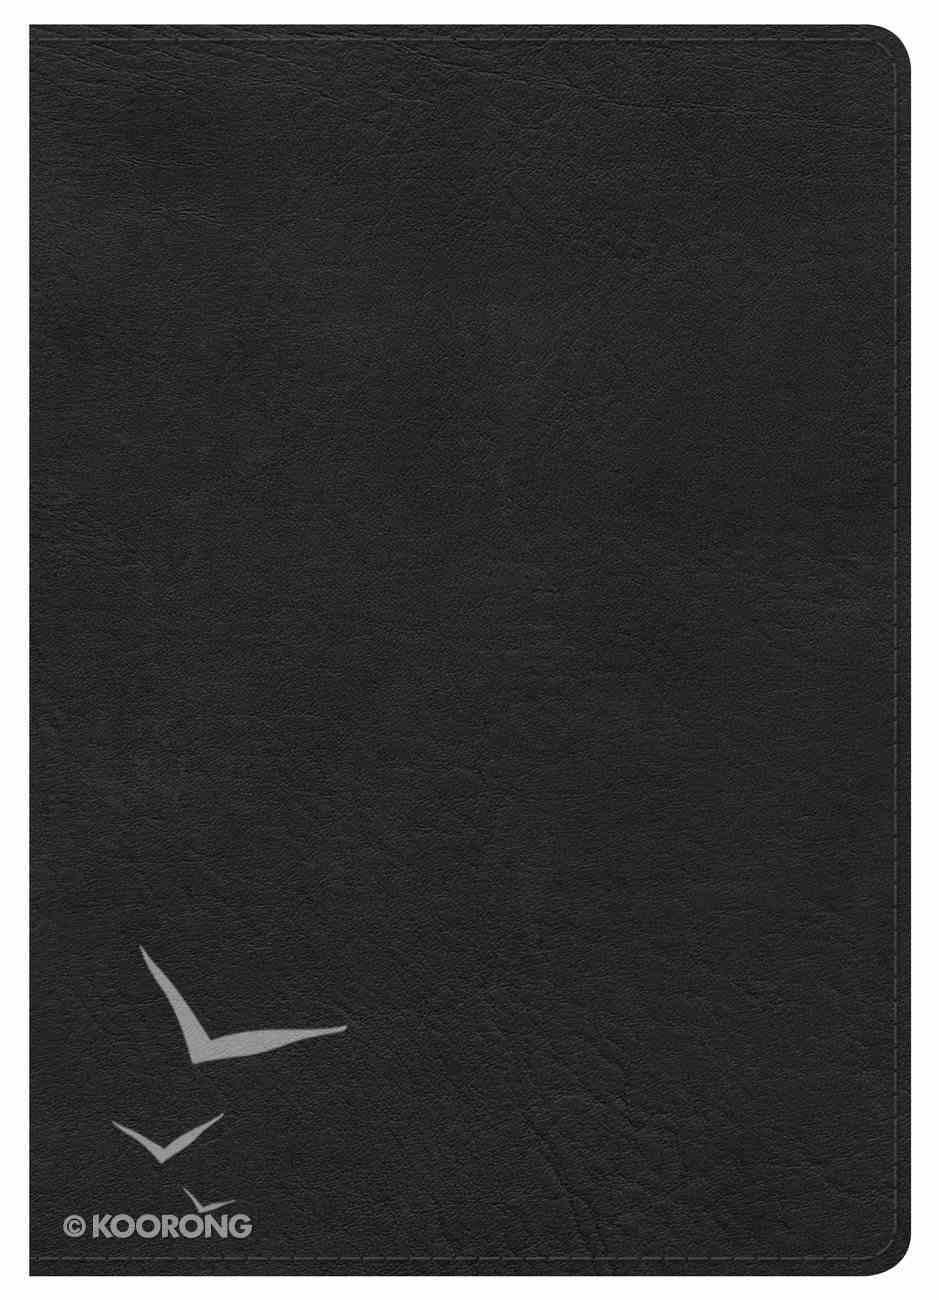 KJV Large Print Compact Reference Bible Black Imitation Leather